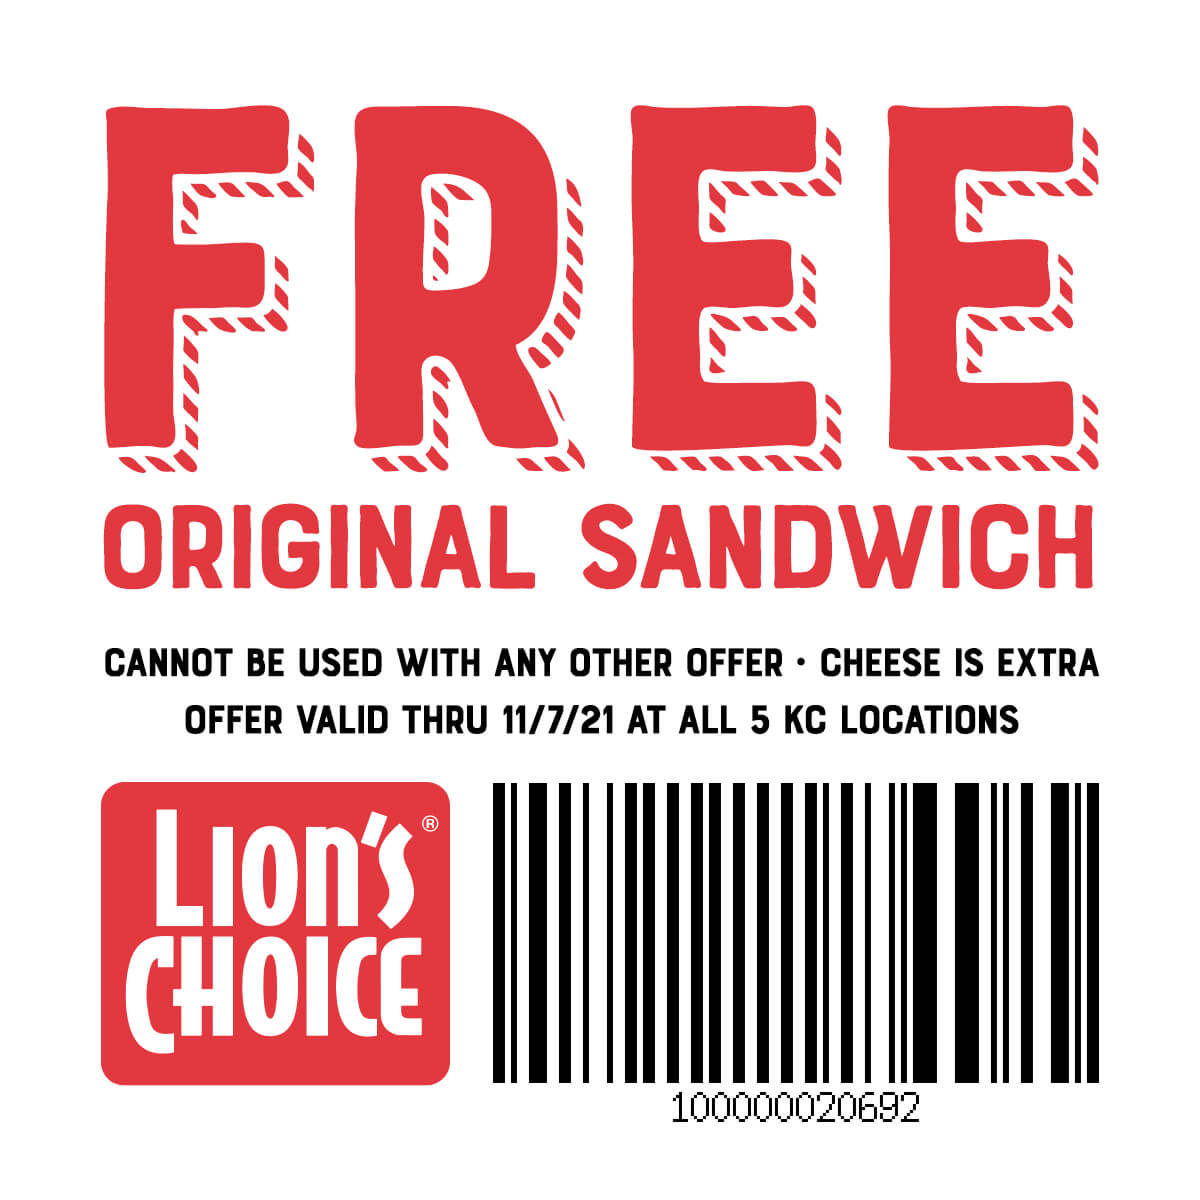 Free Original Sandwich